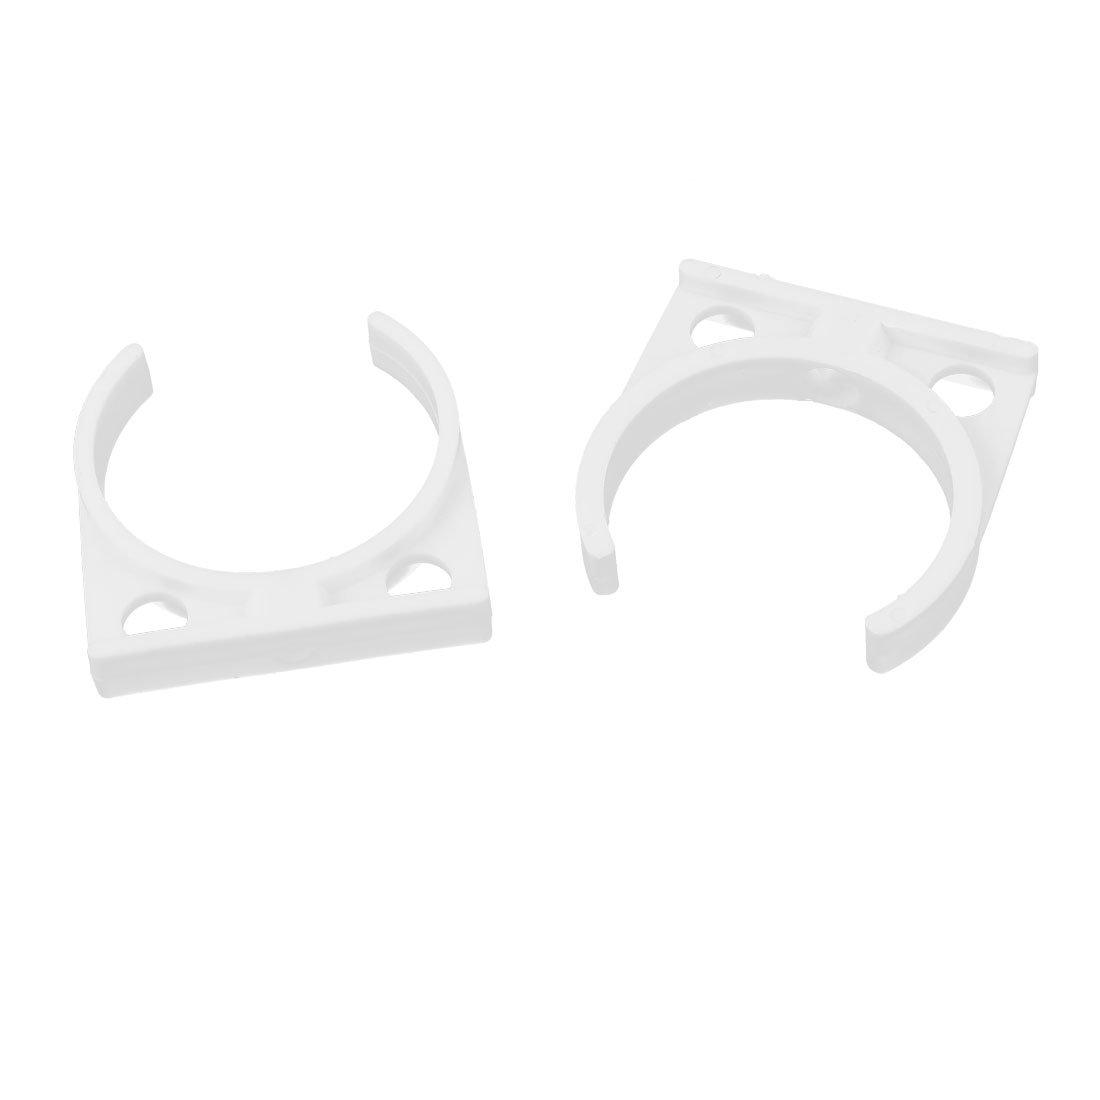 Plastic Filter Housing Clamp Clip 2.2 Inch Diameter 2 Pcs White